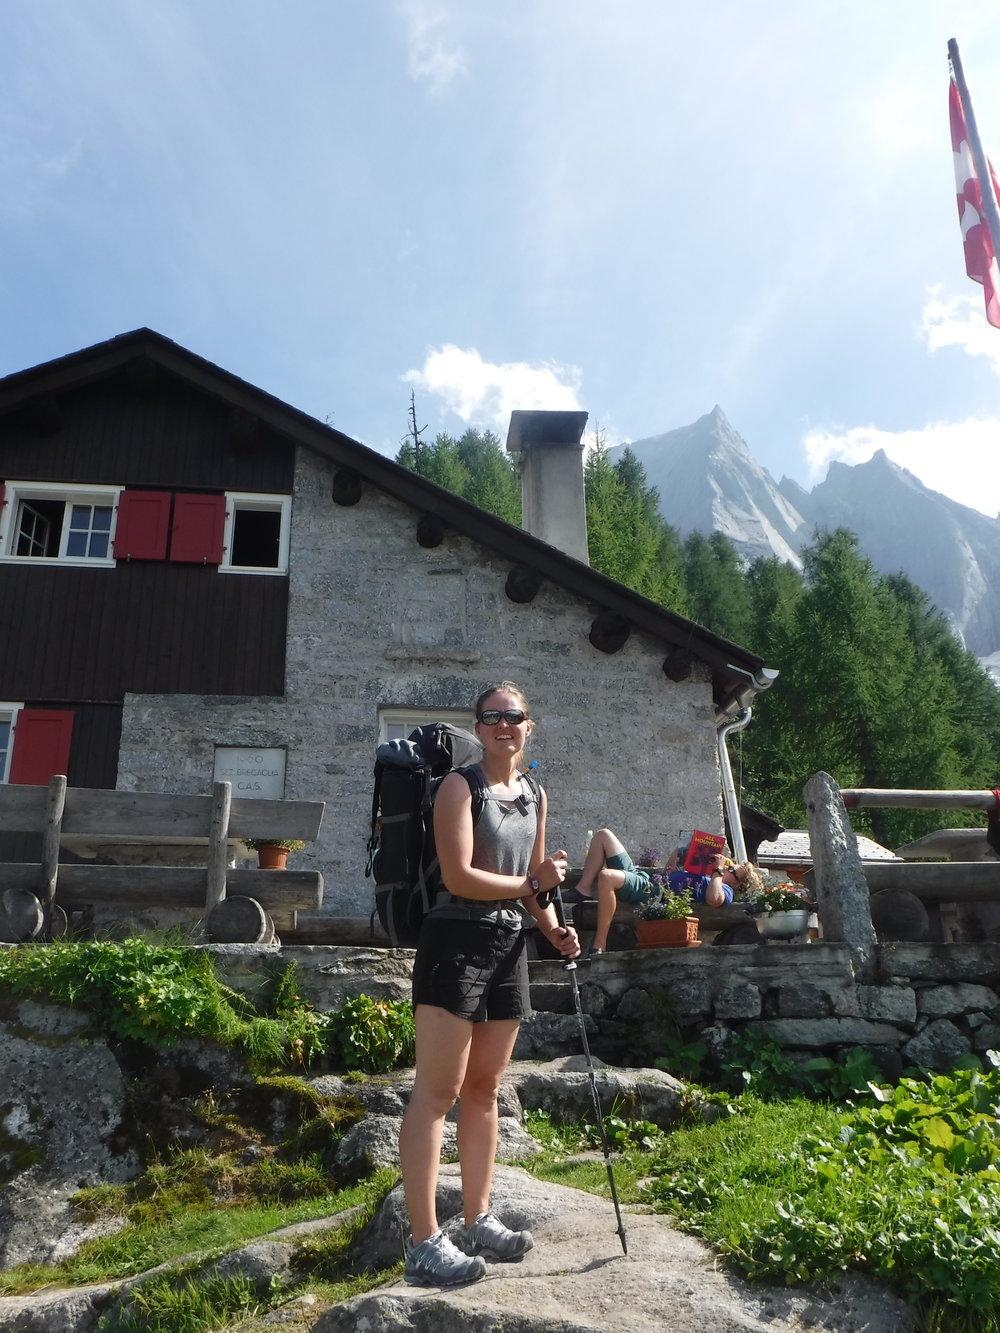 Sasc Fura hut with Piz Badile behind